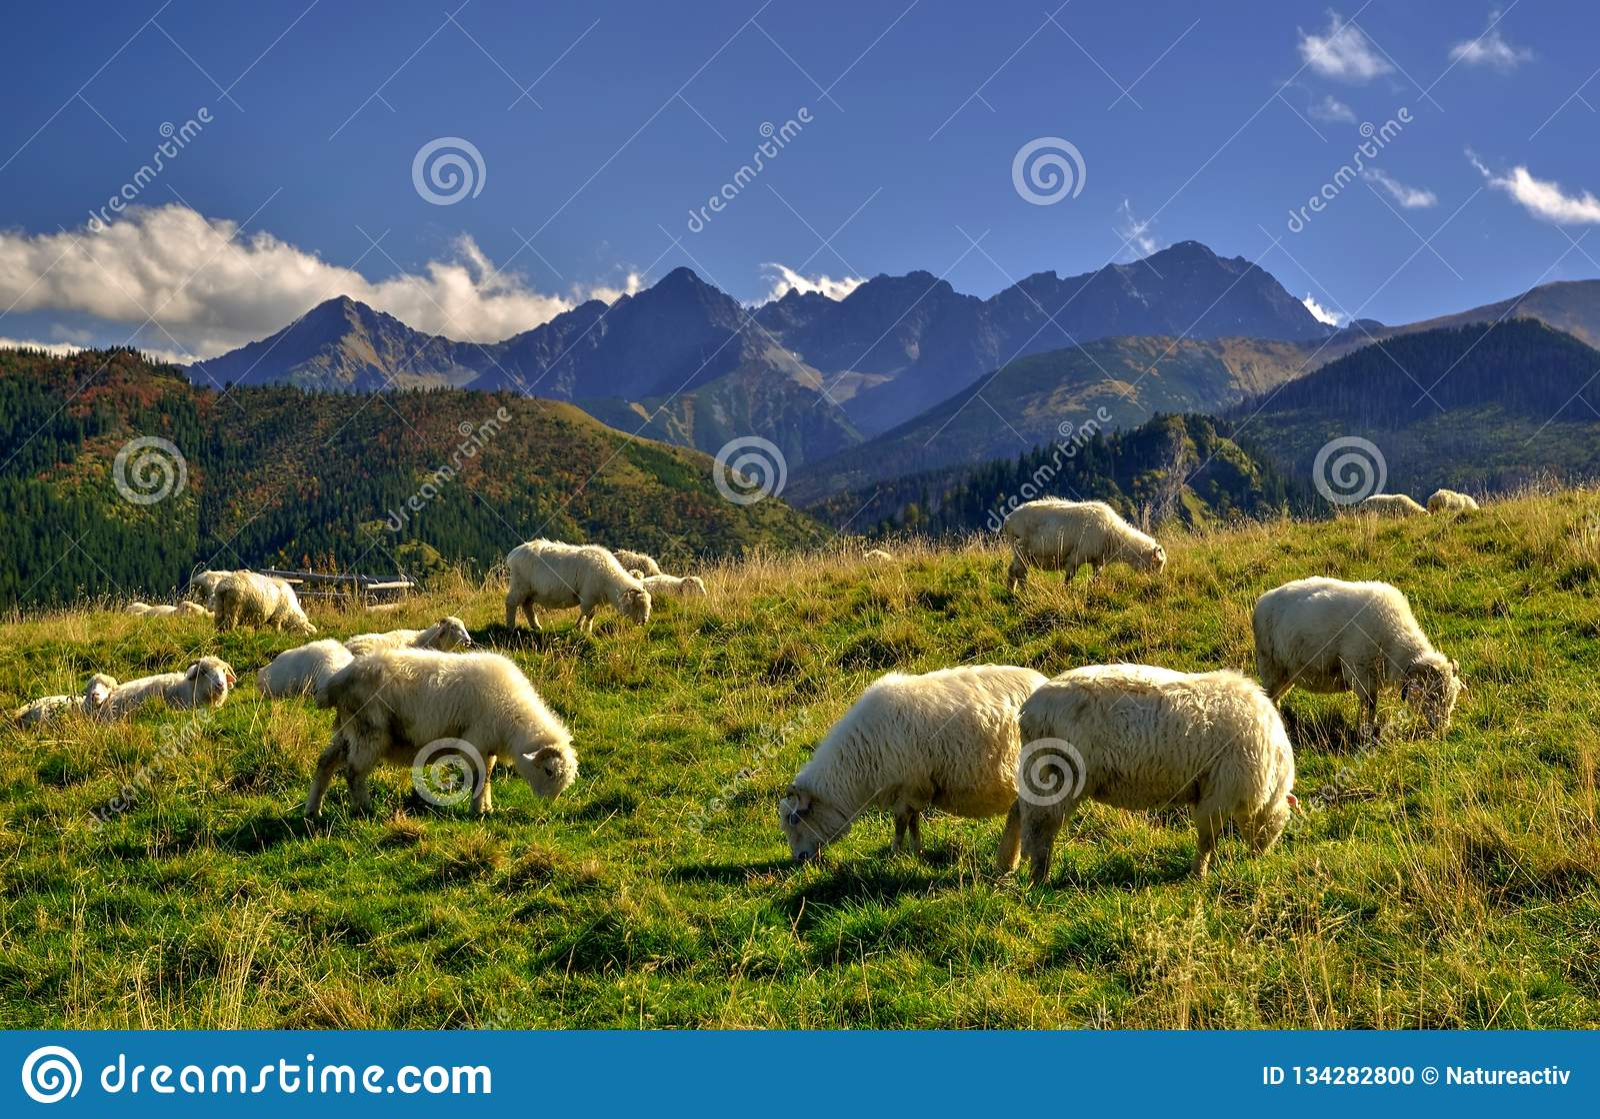 Sheep on a beautiful mountain meadow.